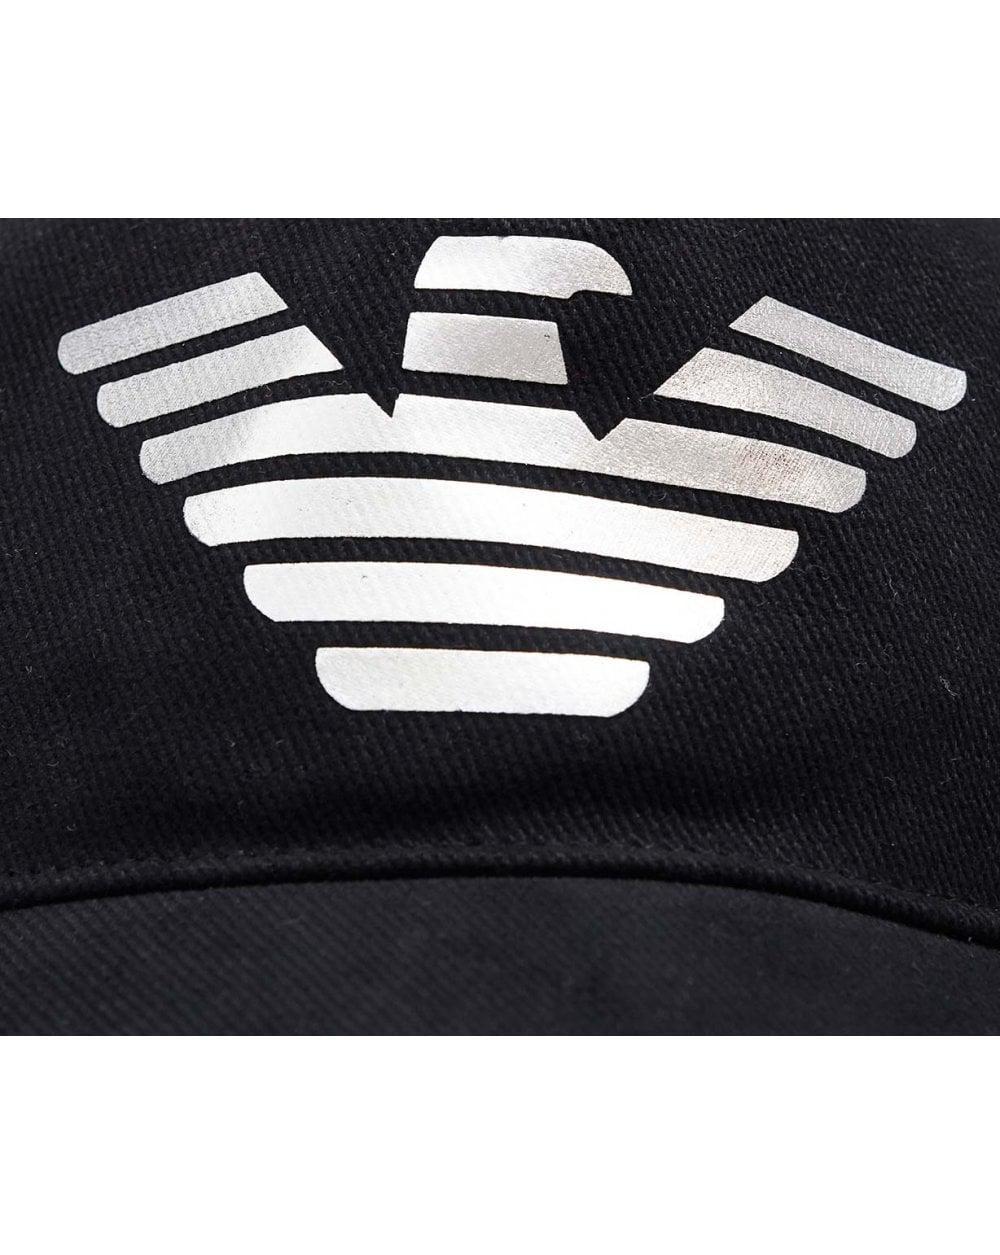 6cb0b183776e2 Armani Jeans Metallic Eagle Logo Cap in Black for Men - Lyst